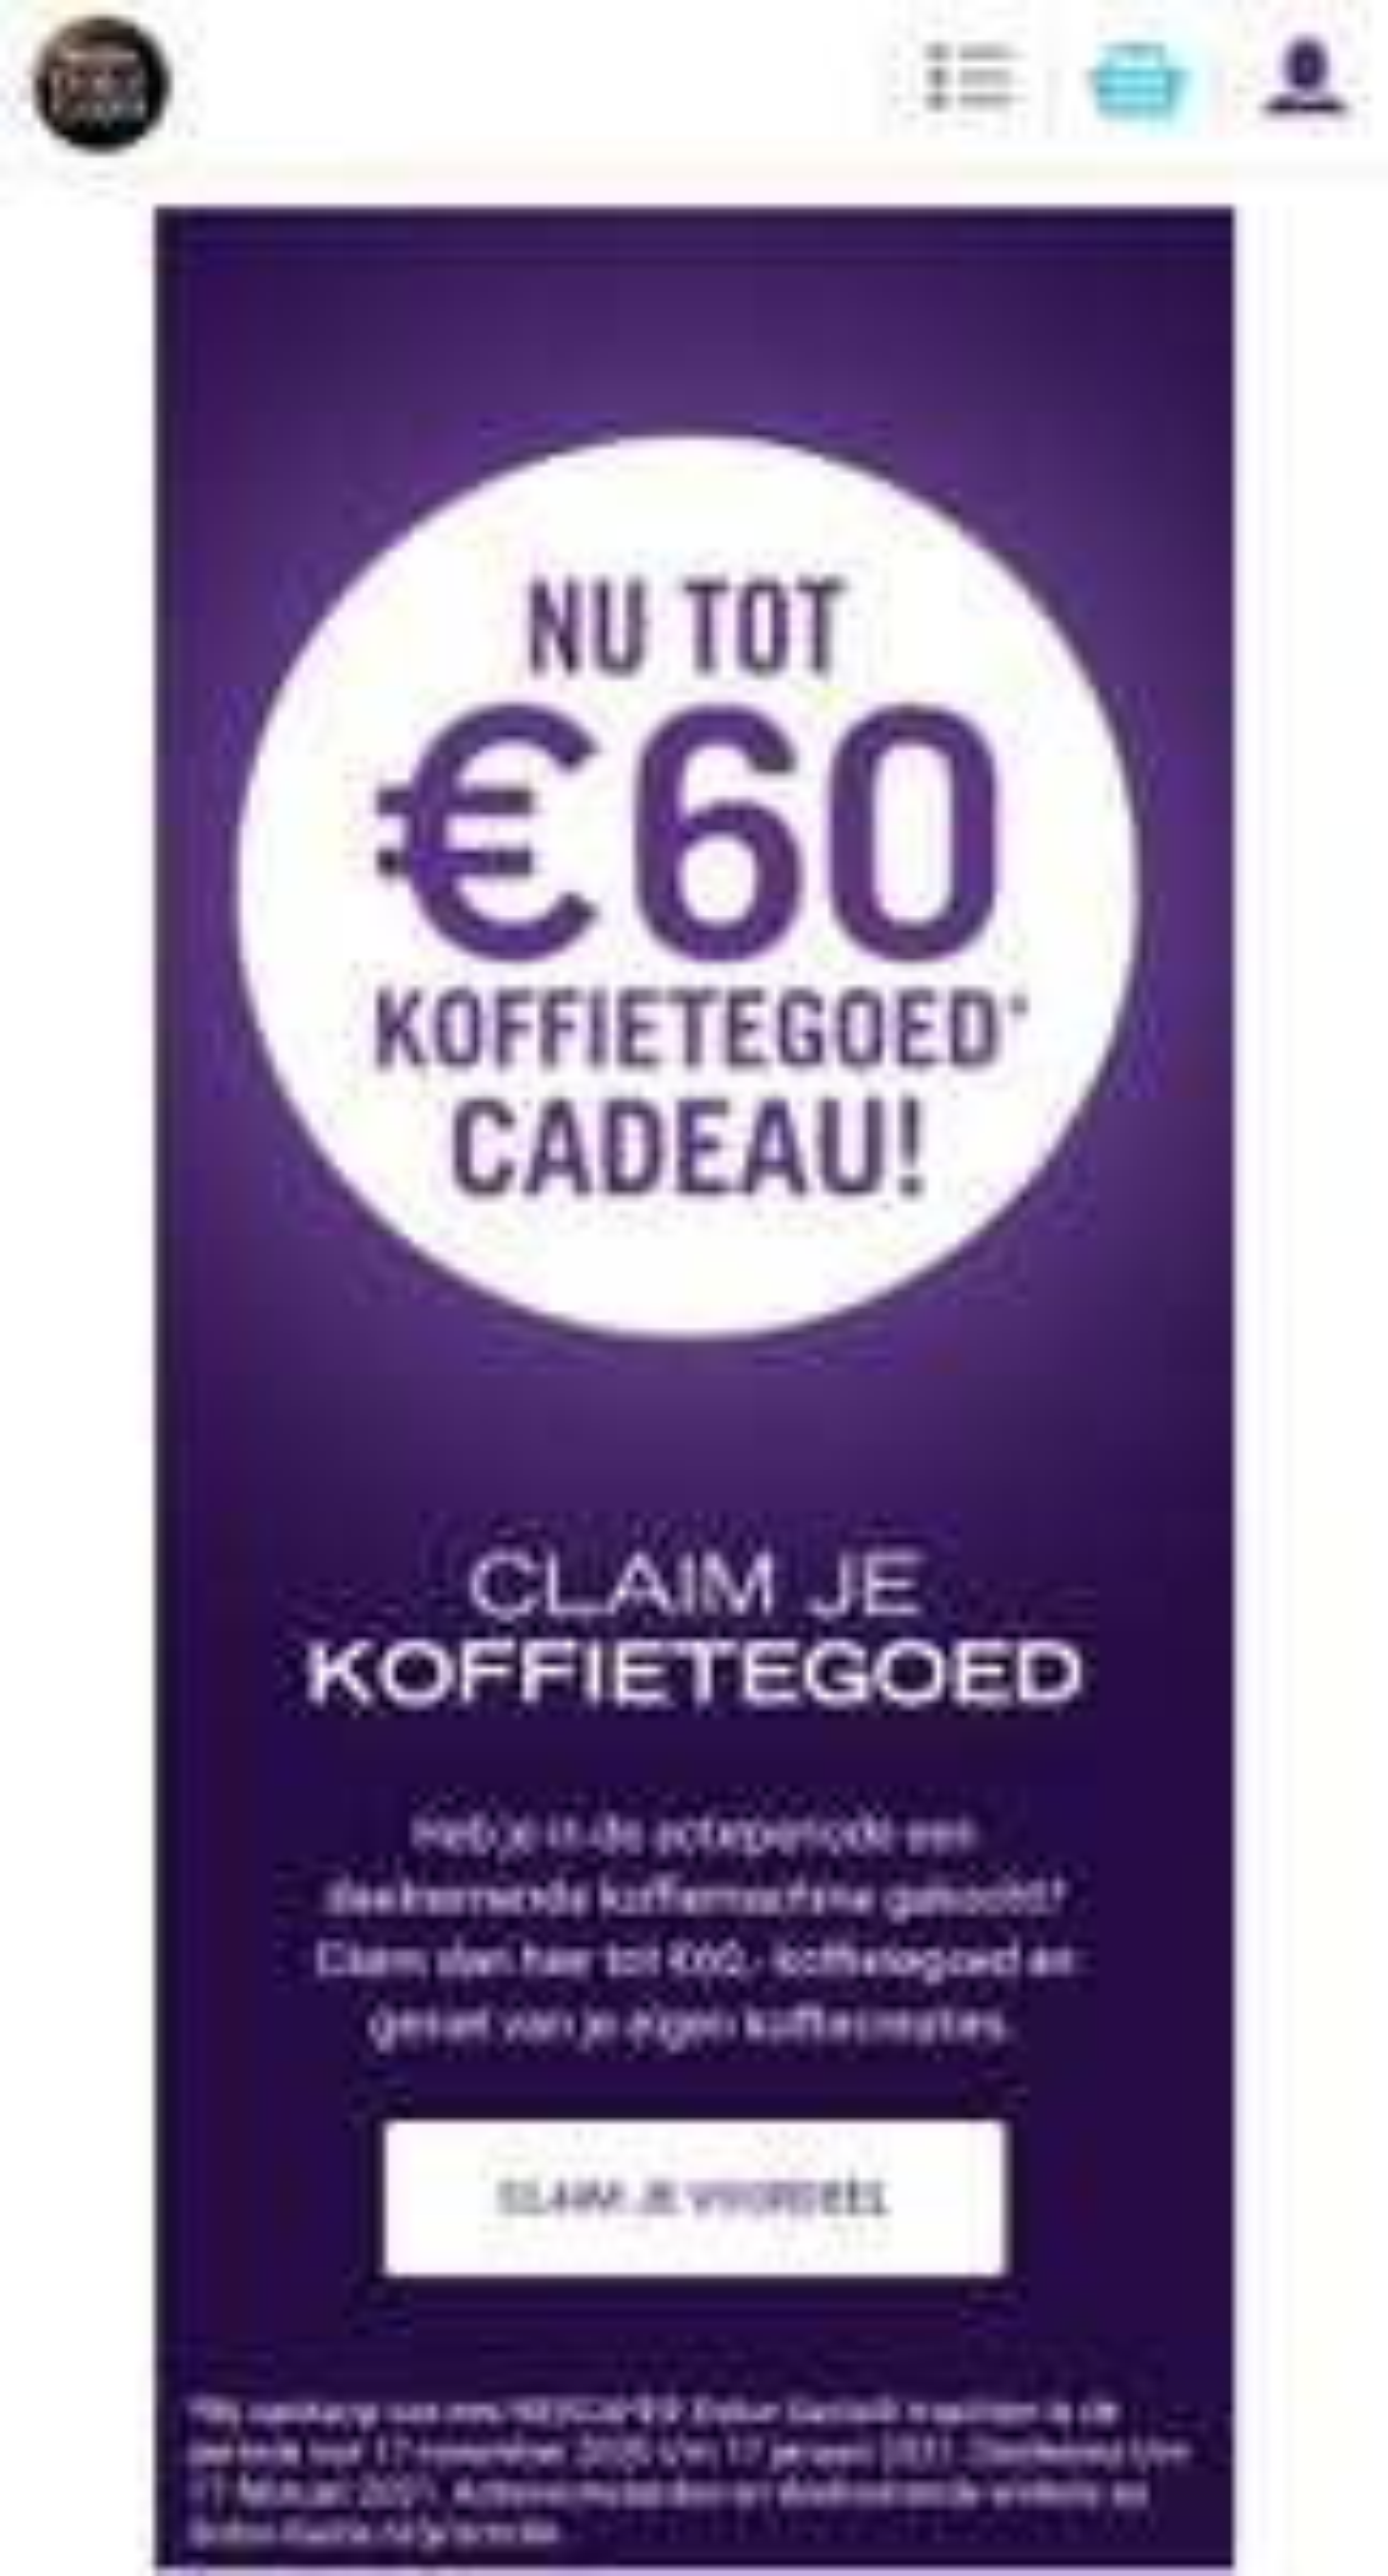 (Tot) €60 koffietegoed bij Dolce Gusto (lees omschrijving)